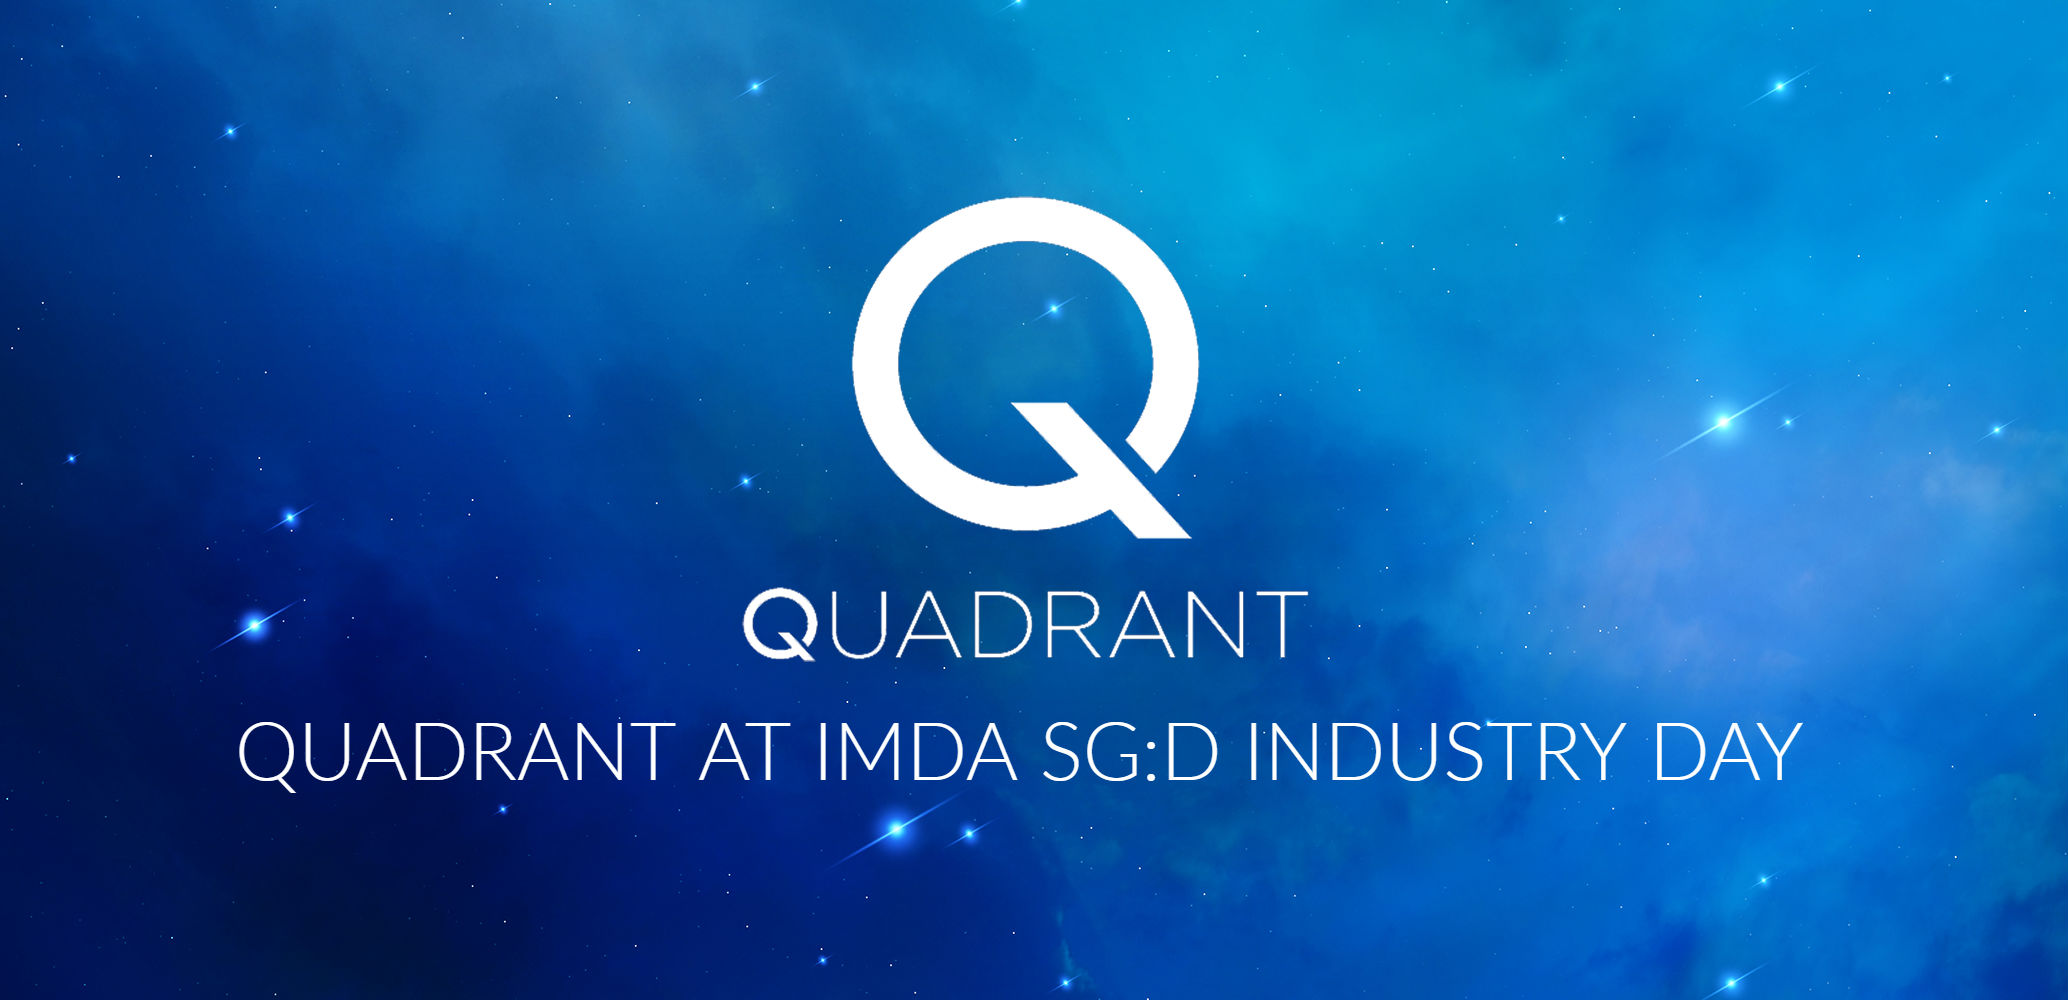 Quadrant IMDA Industry Day Recap